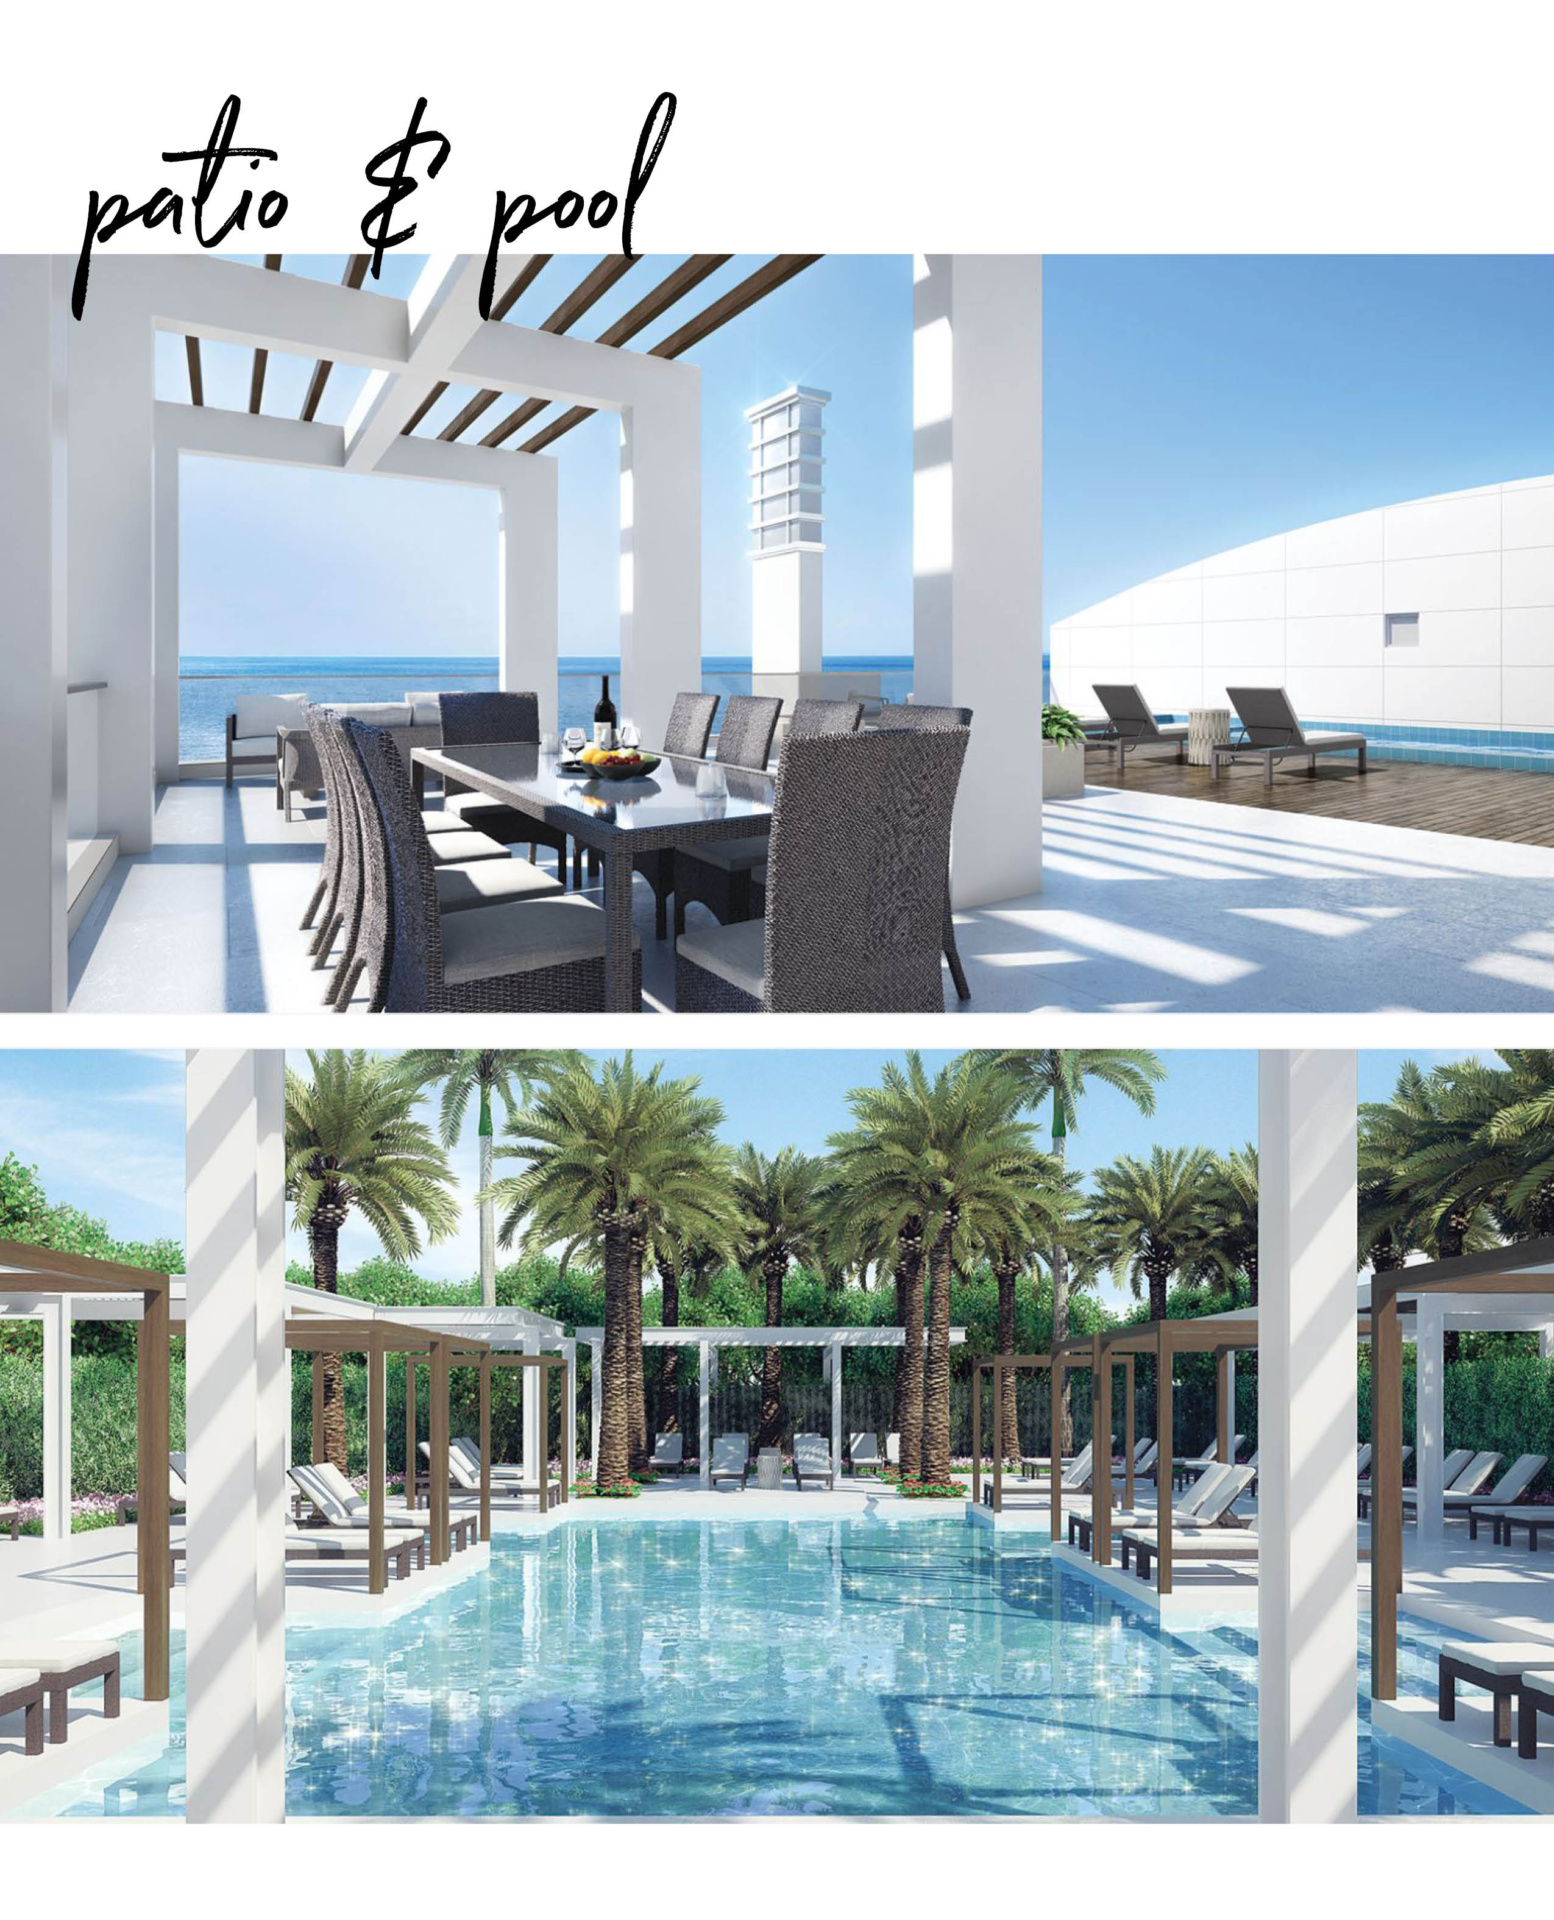 Mystique patio and pool